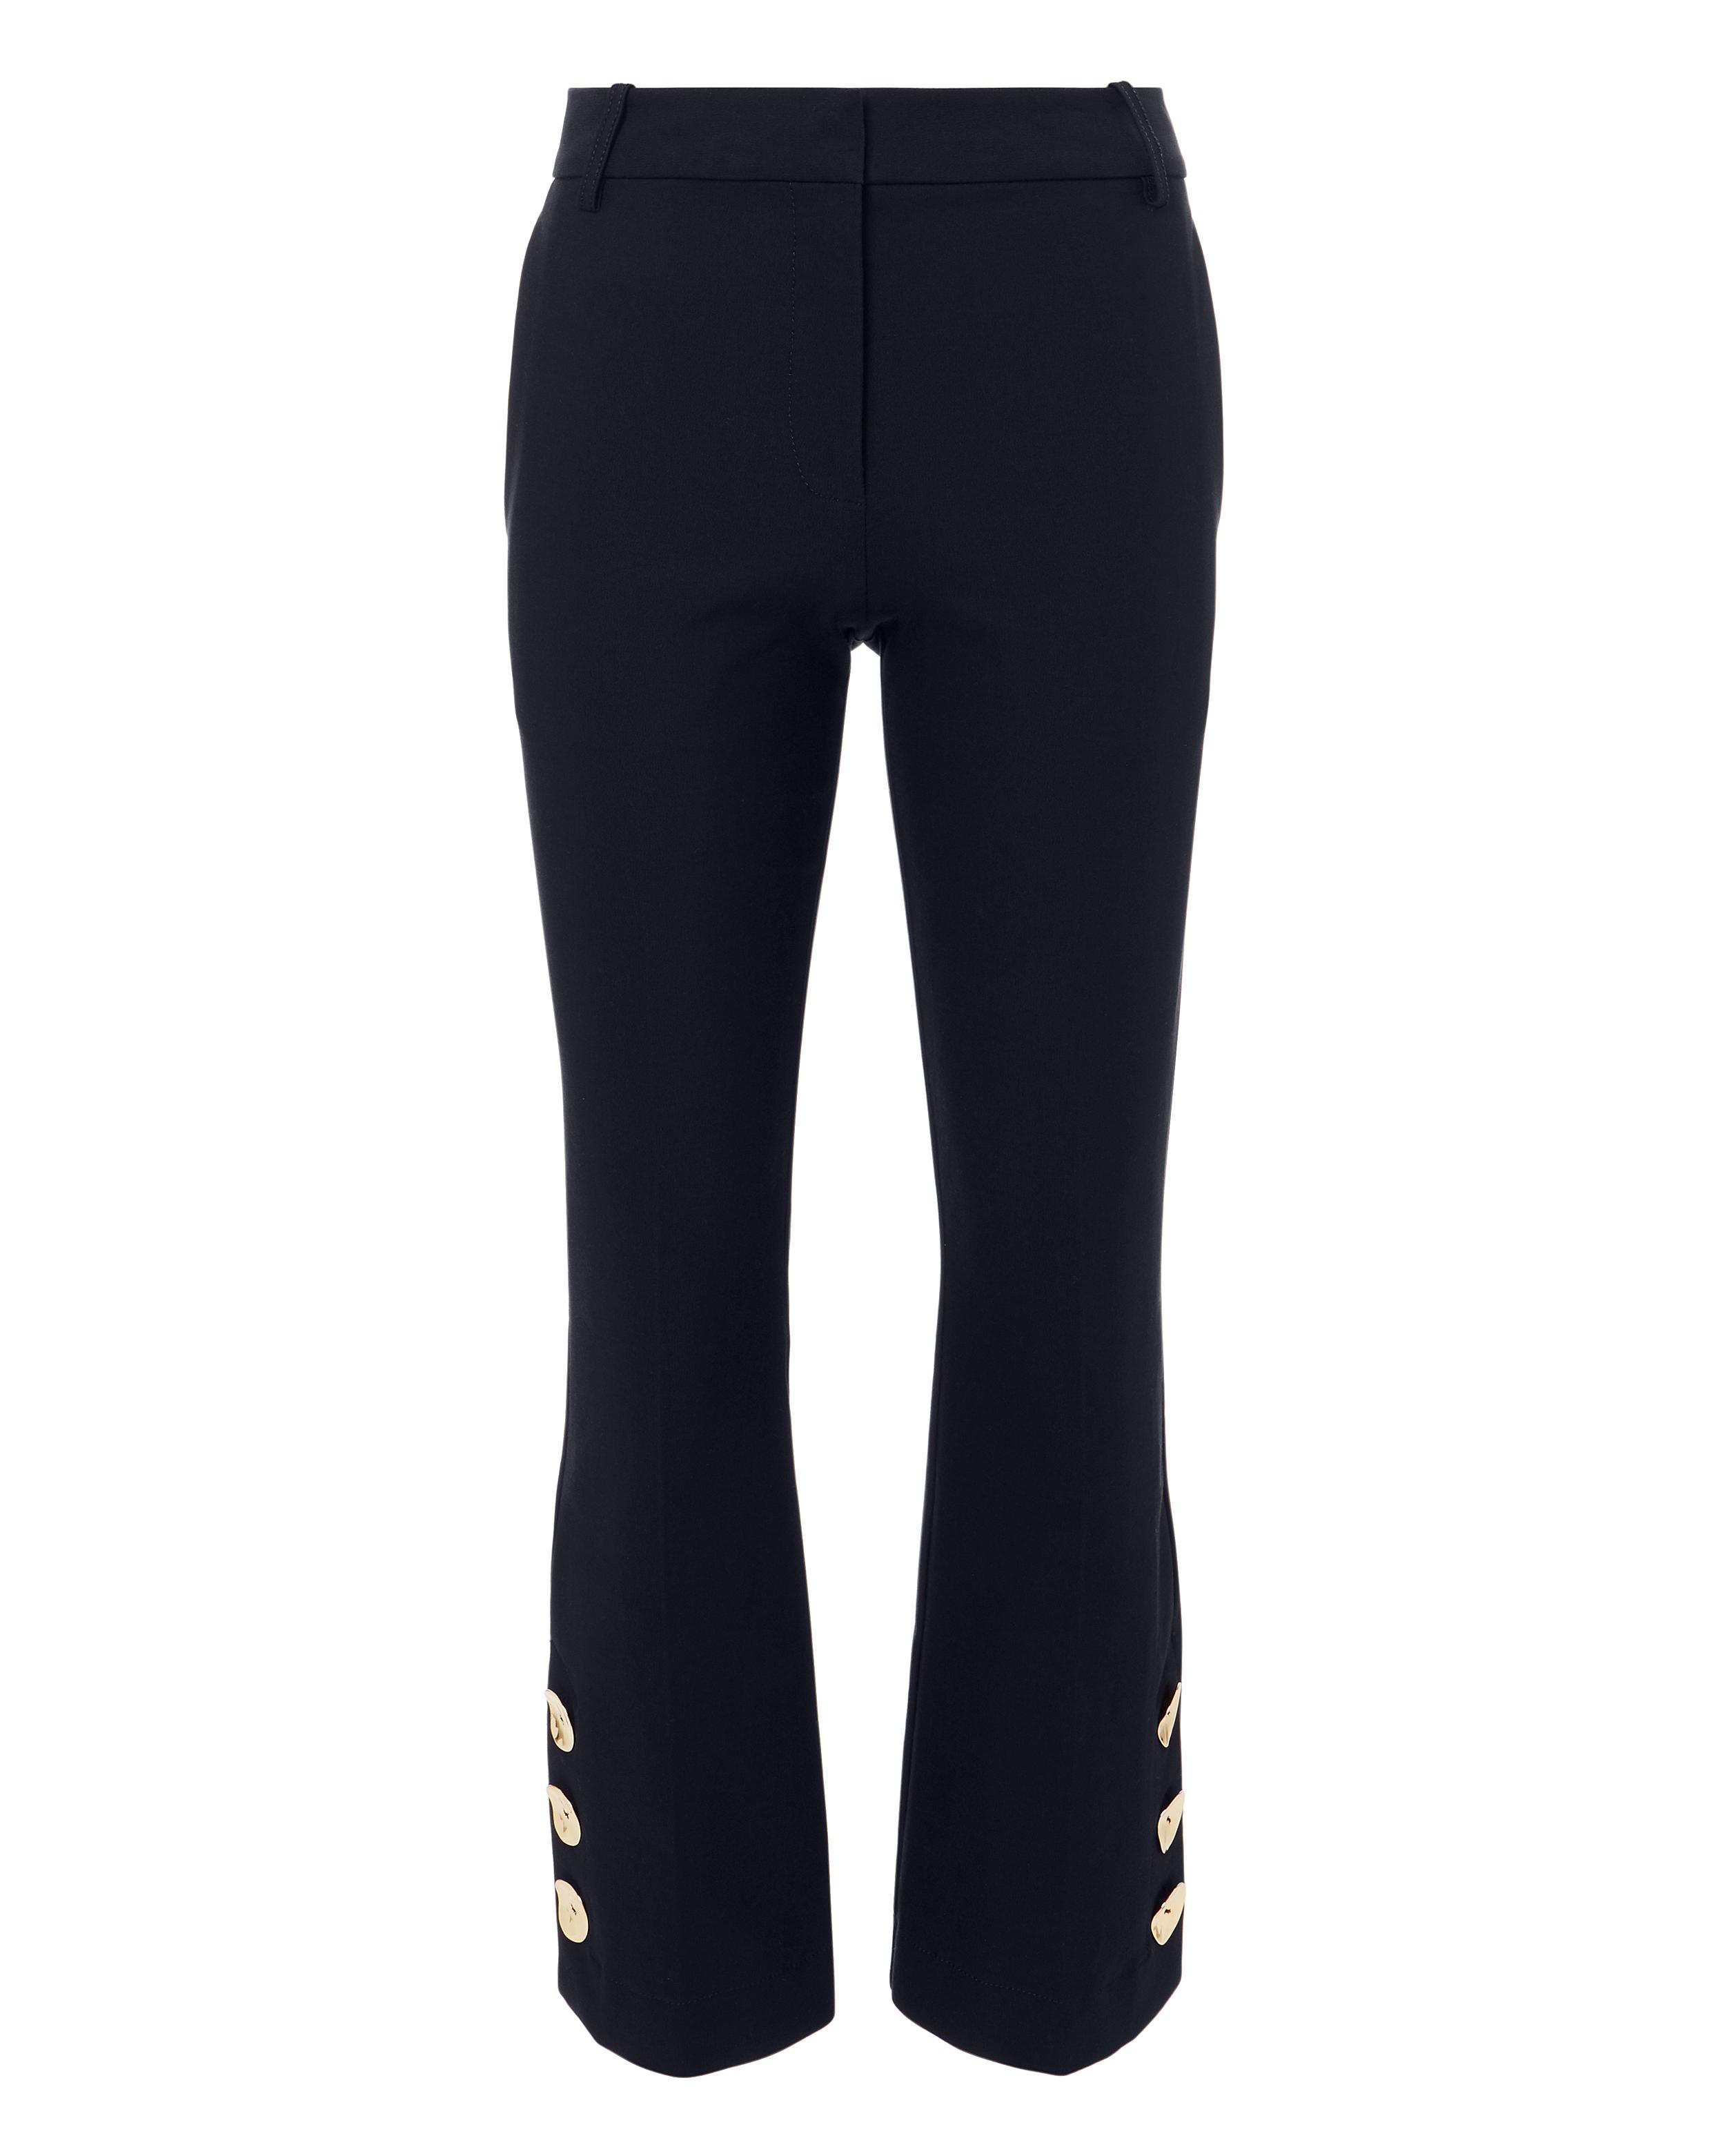 10 CROSBY Slit Hem Crop Flare Trousers